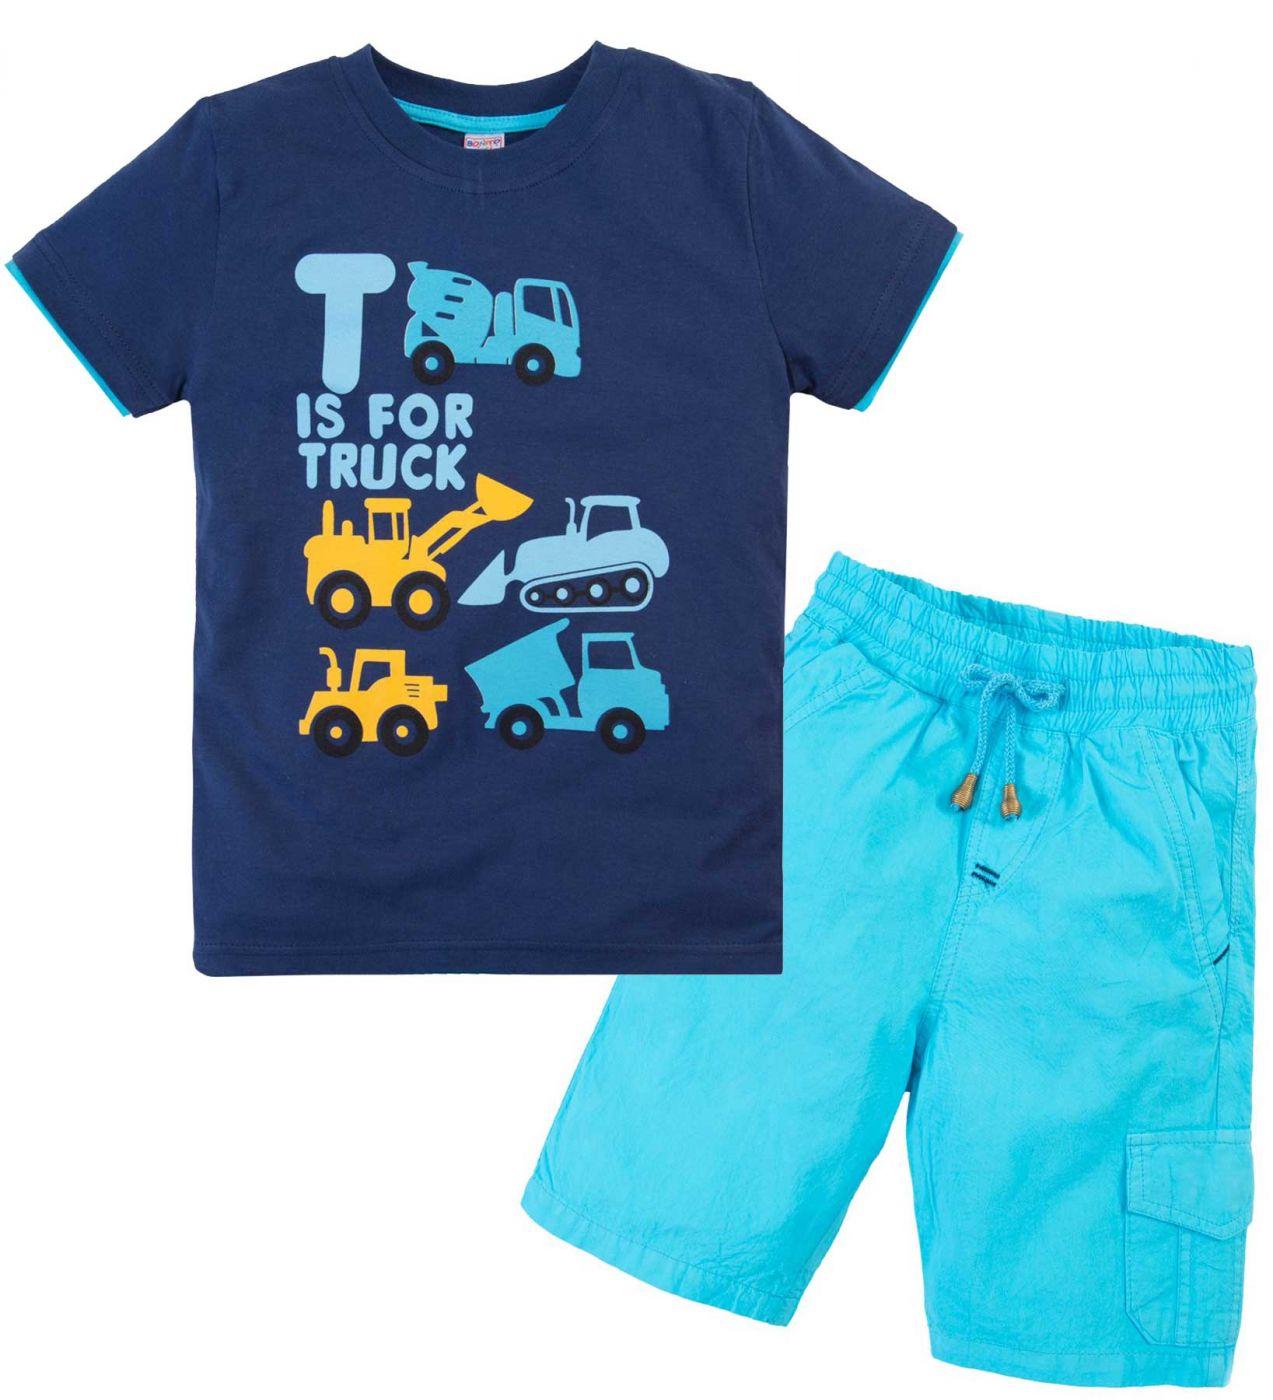 Костюм для мальчика синий, голубой